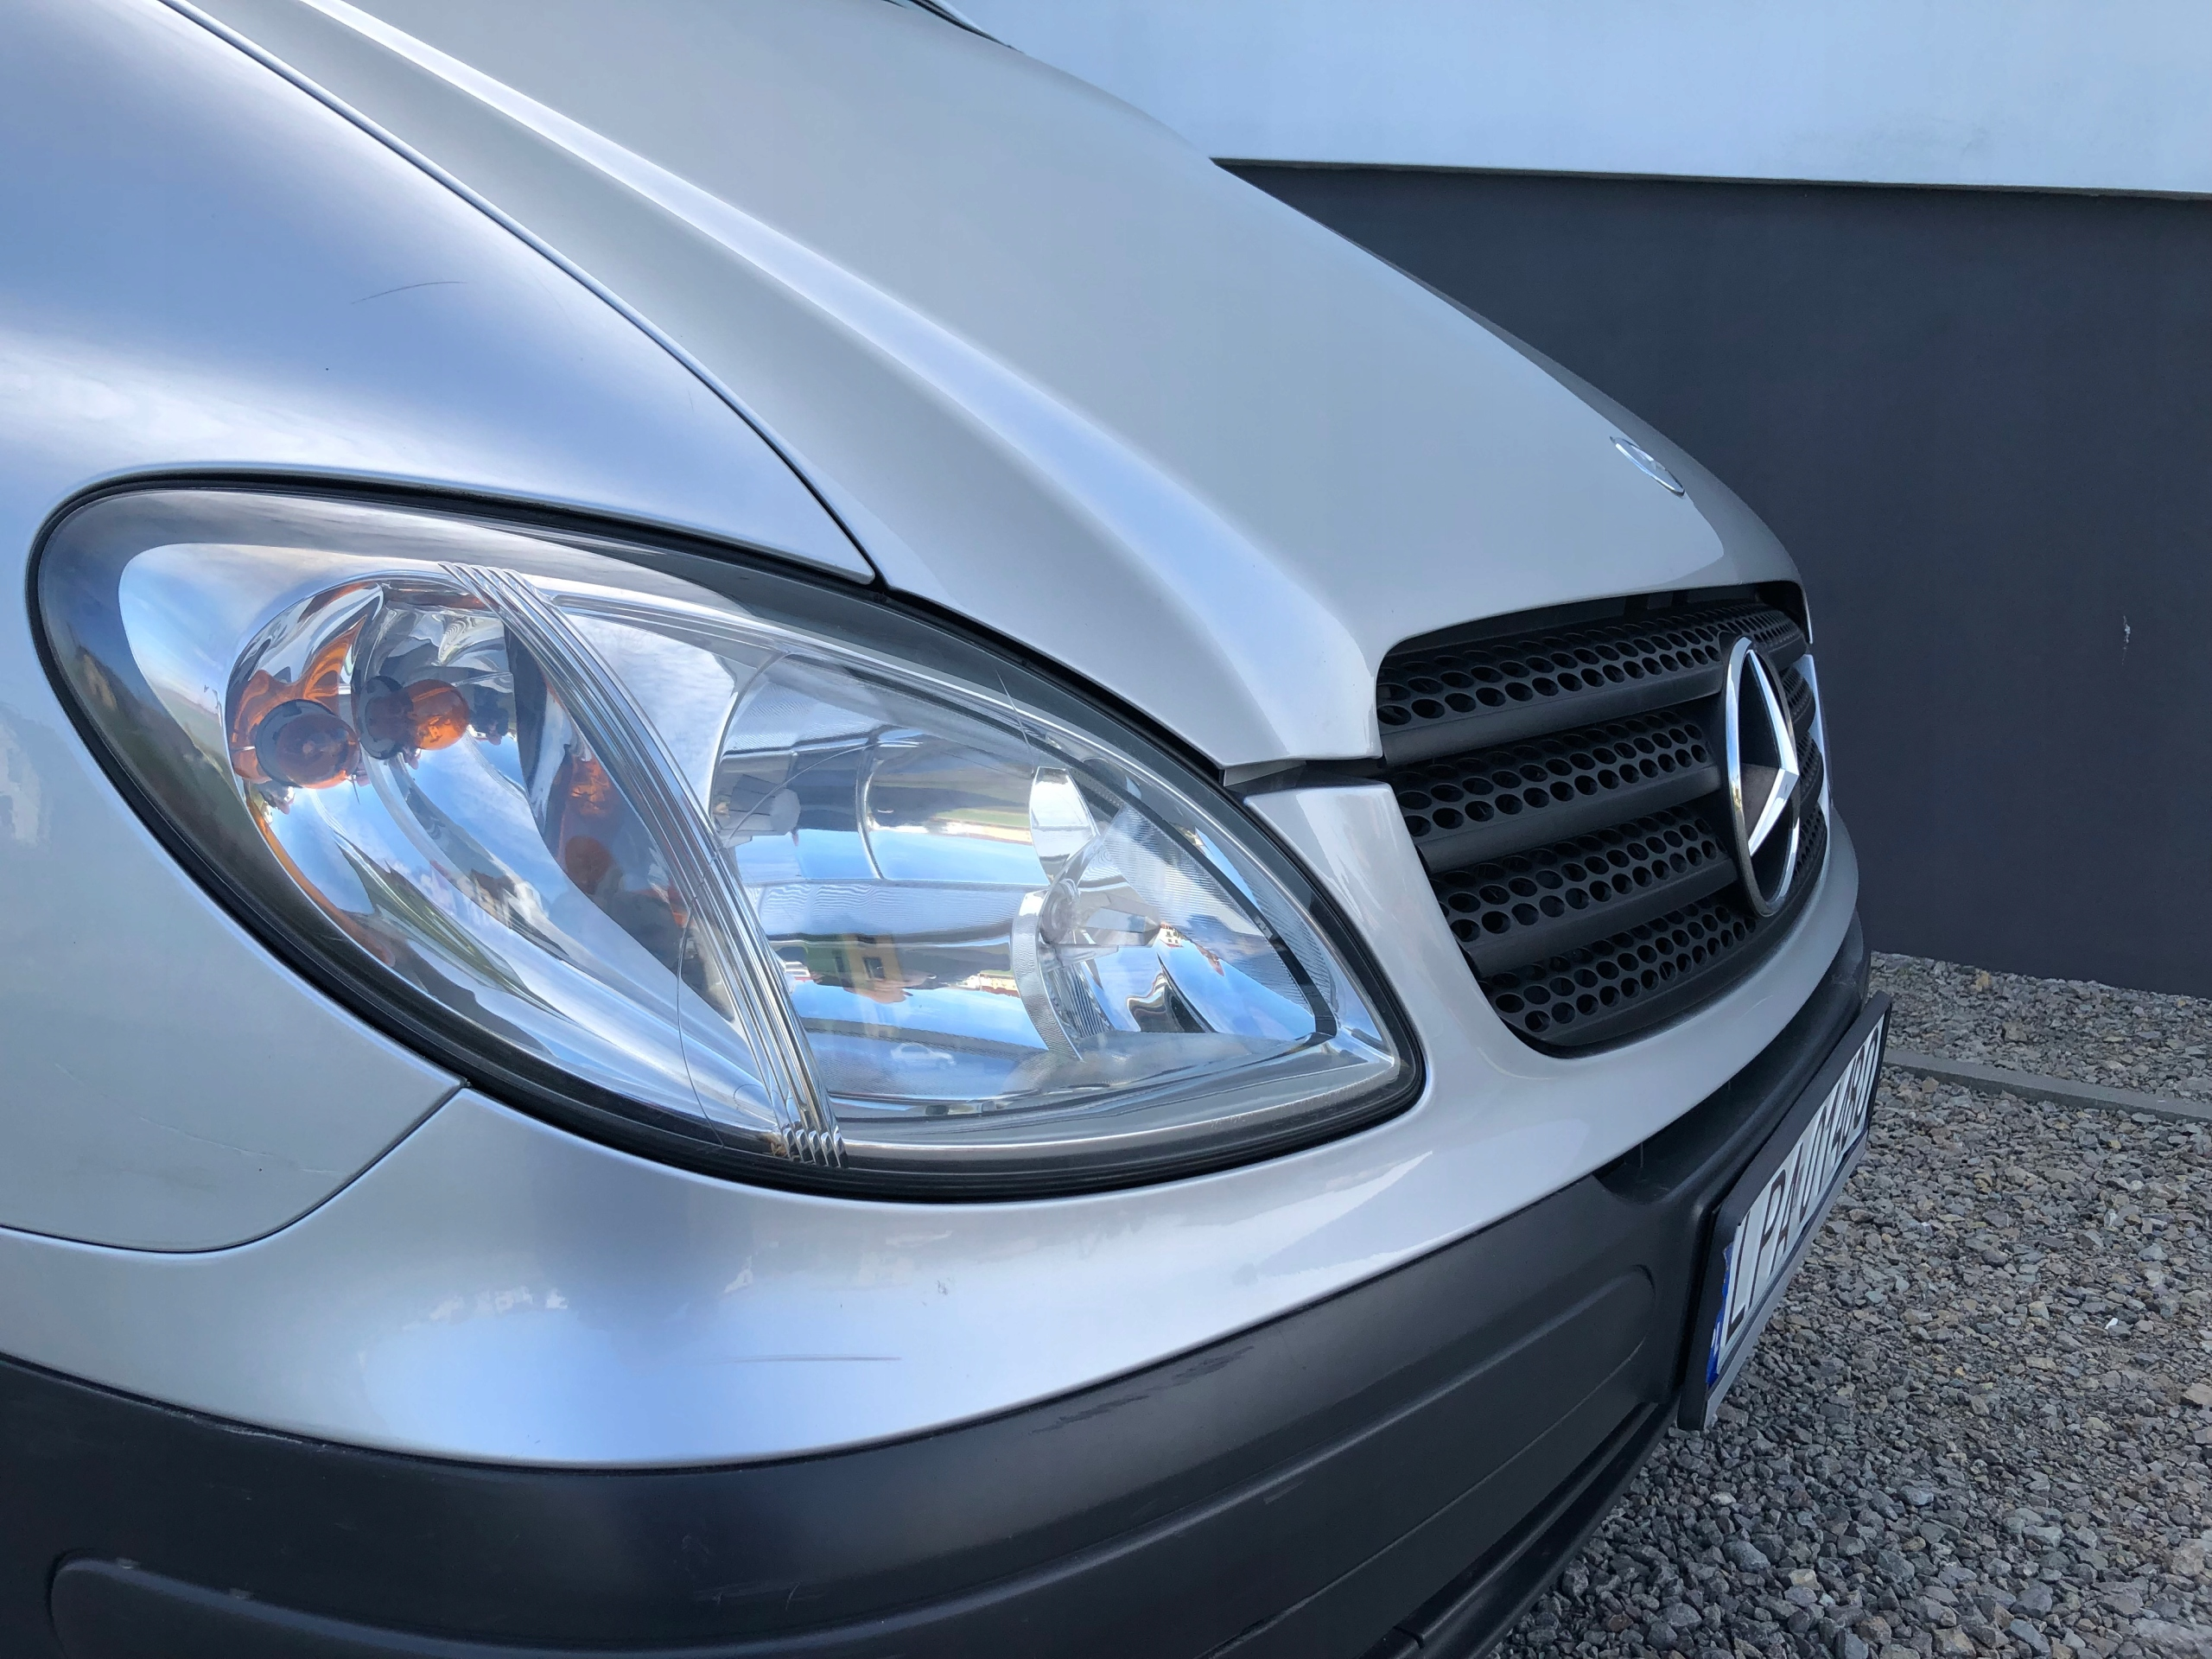 Mercedes Vito 115 cdi org. przebieg 200000 km